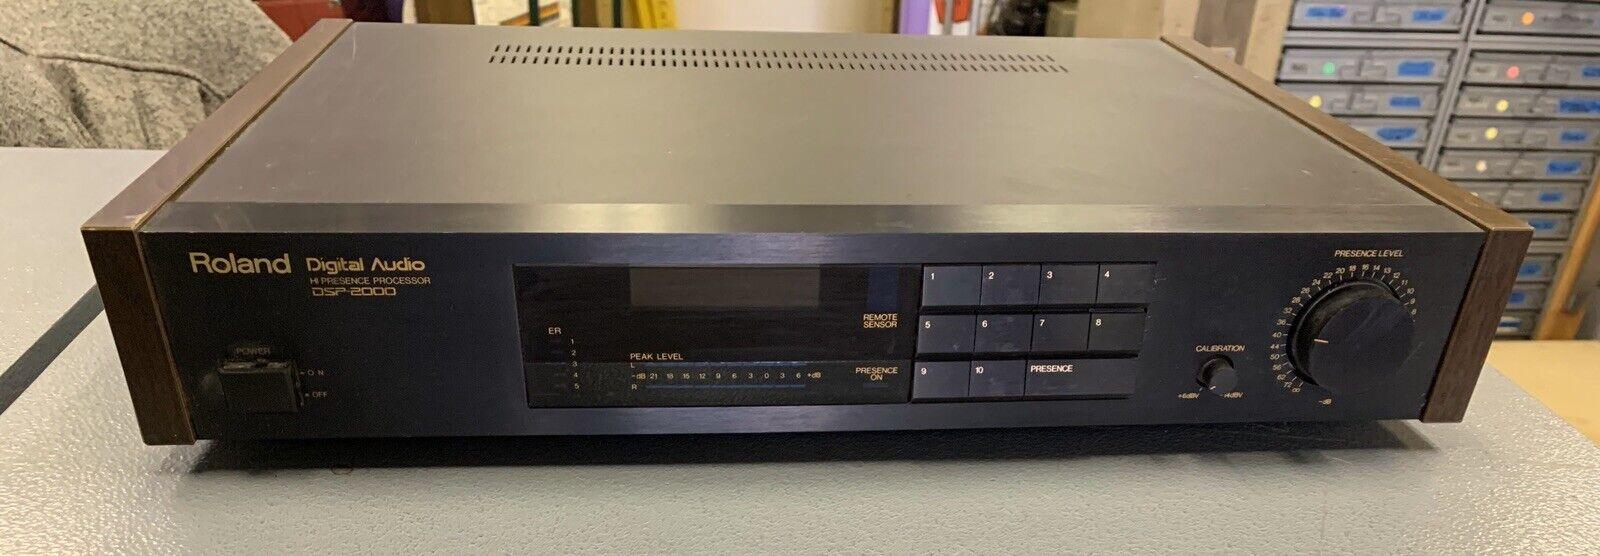 Vintage Roland DSP-2000 Hi Presence Audio Processor with original box